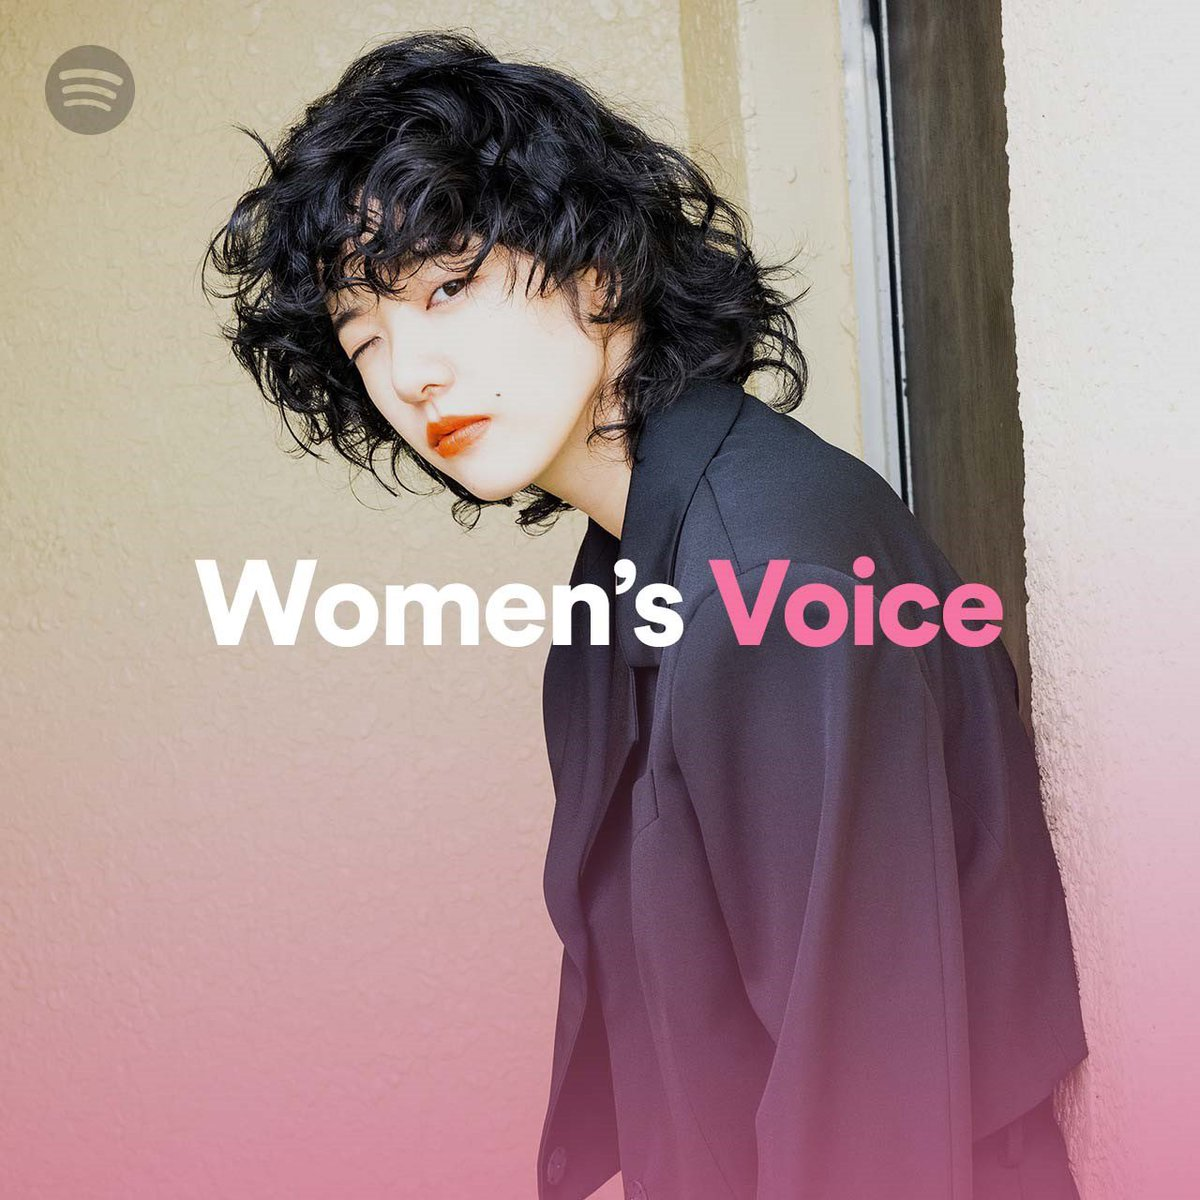 🤍NEWS🤍Spotifyのプレイリスト「Women's Voice」のカバーにあいみょん!新曲「ハート」が入っています。ぜひ聴いてみてください。#あいみょんハート #Spotify #ハンオシ